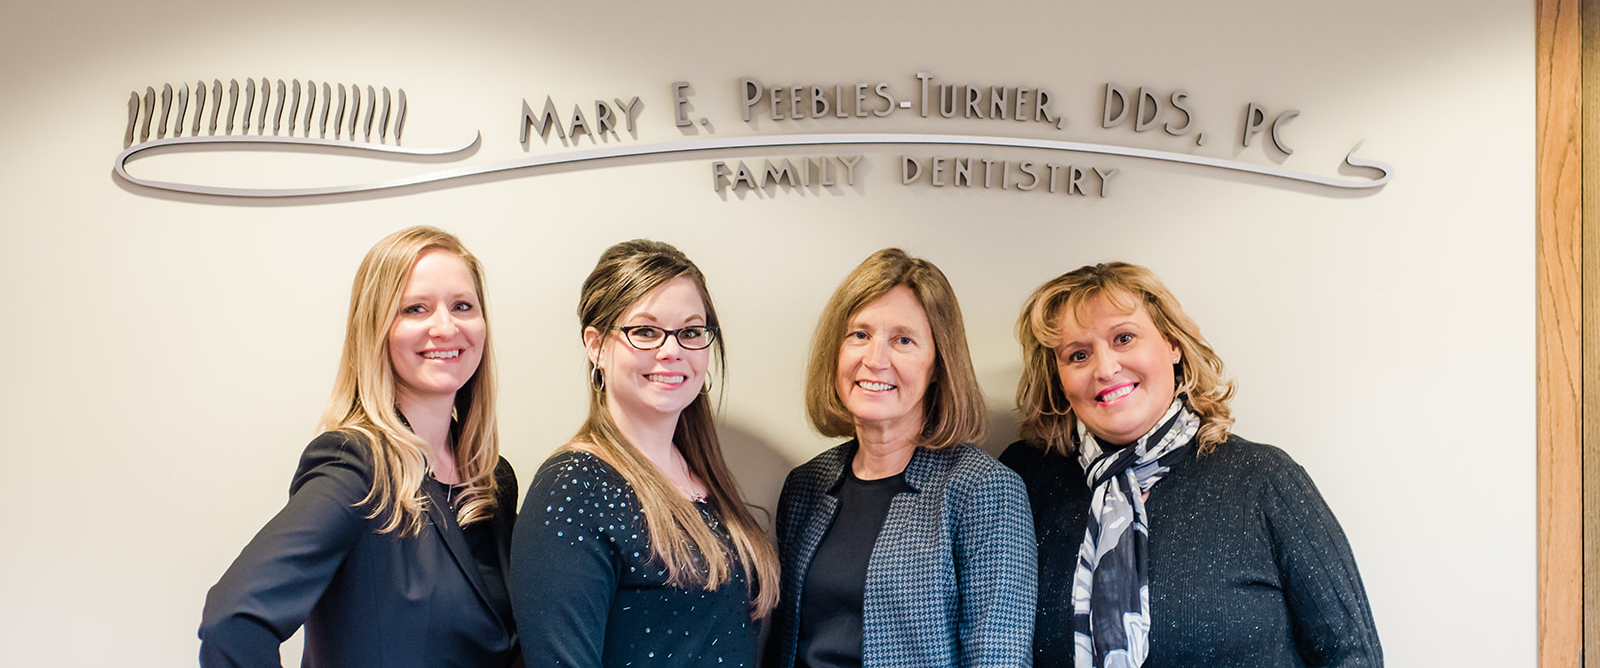 Family Dentistry Staff Photo